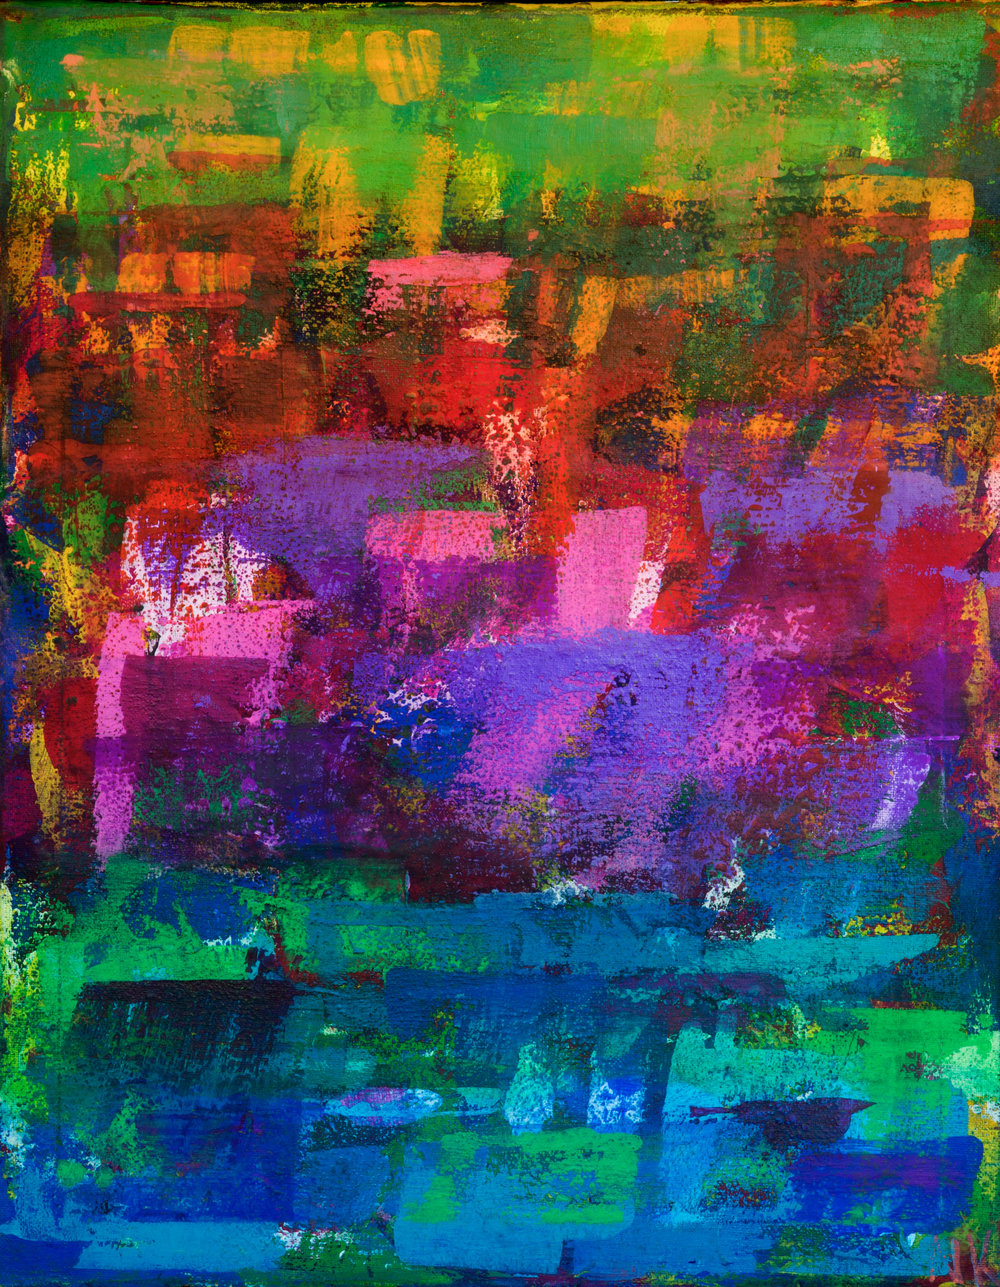 Blue Giraffe, 12x18 Acrylic on Canvas